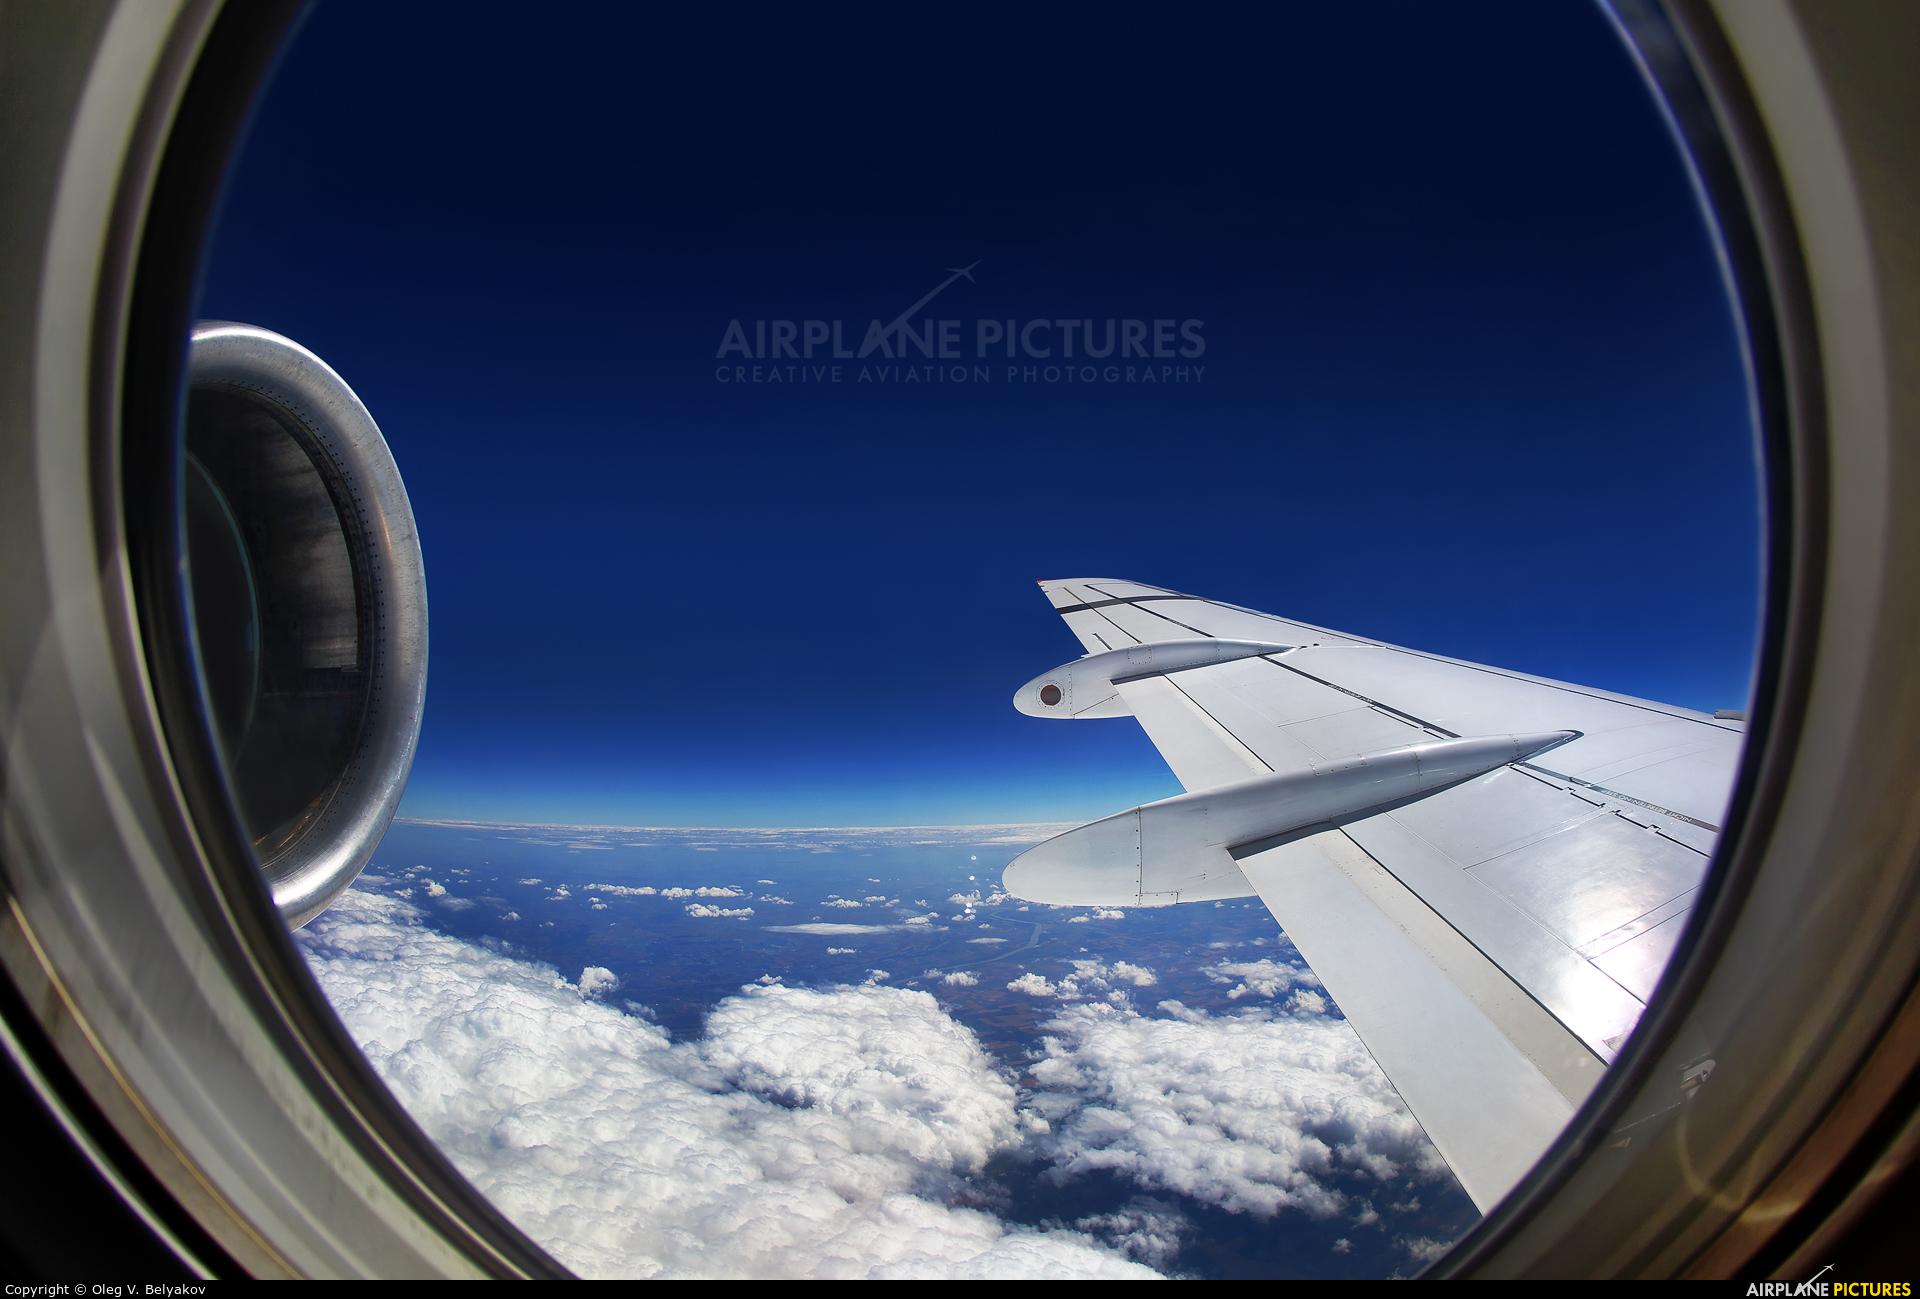 Austrian Airlines/Arrows/Tyrolean OE-LVB aircraft at In Flight - Austria